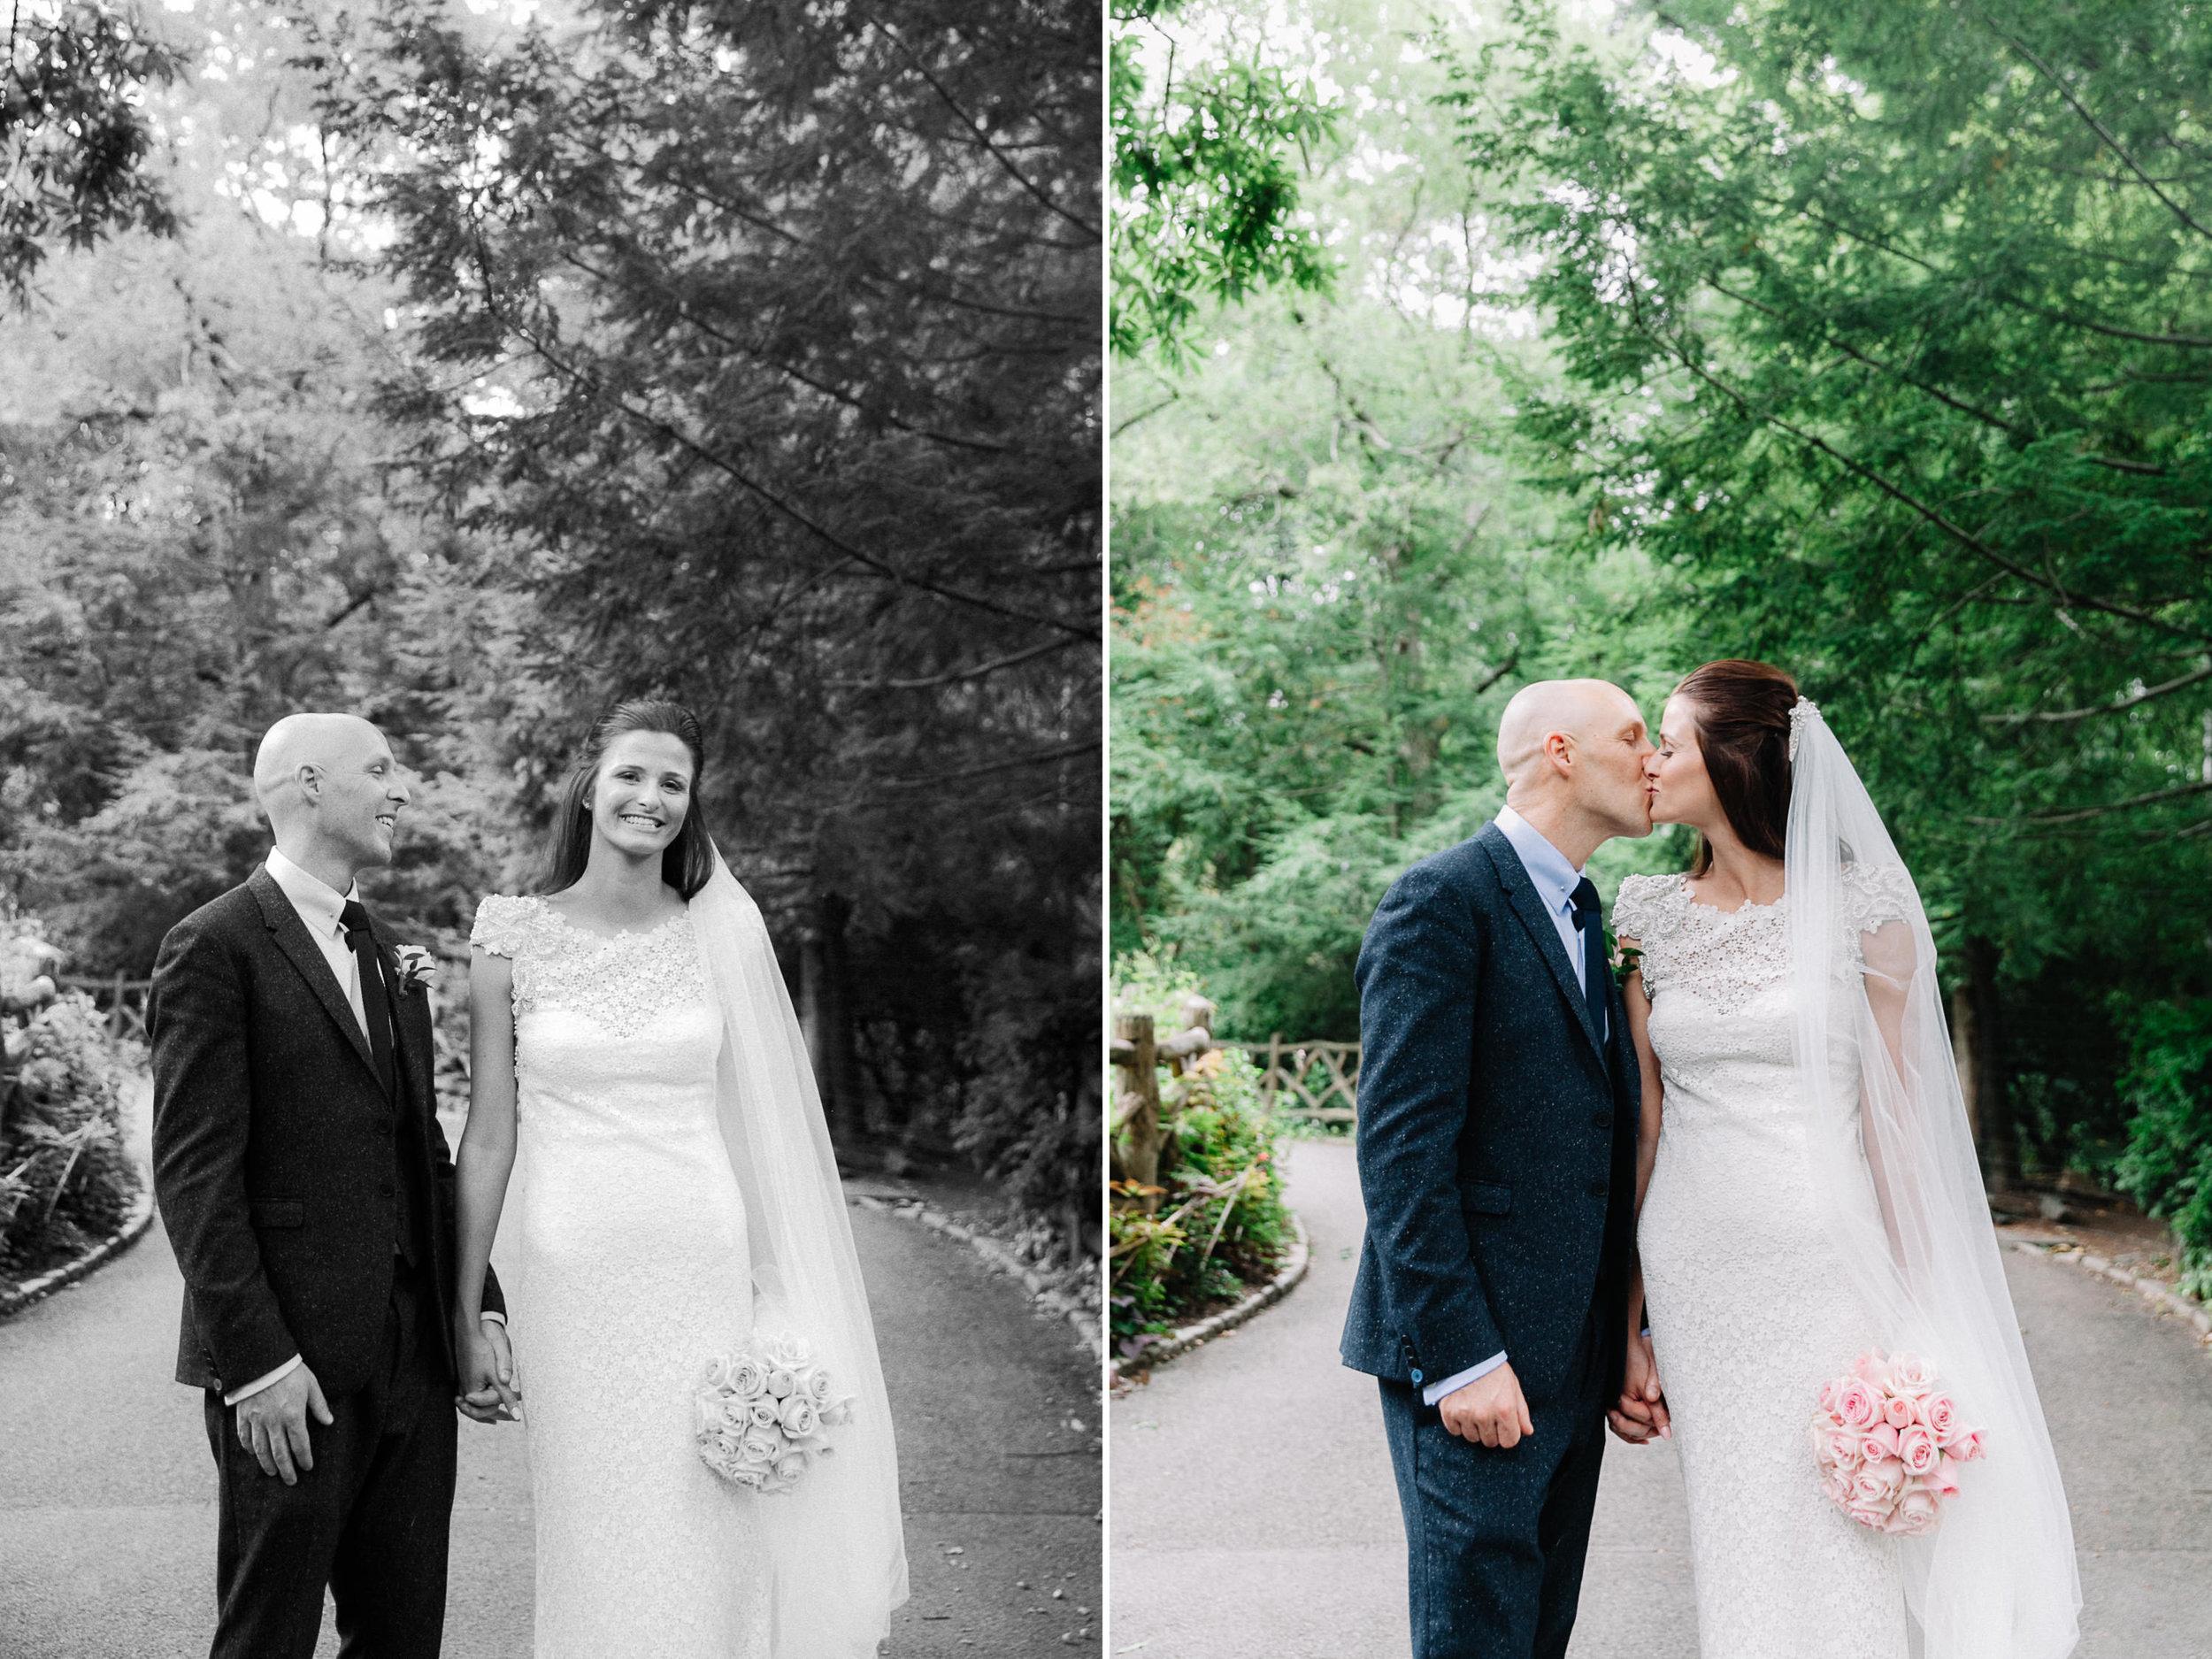 Shakespeare-garden-central-park-intimate-wedding-21-.jpg